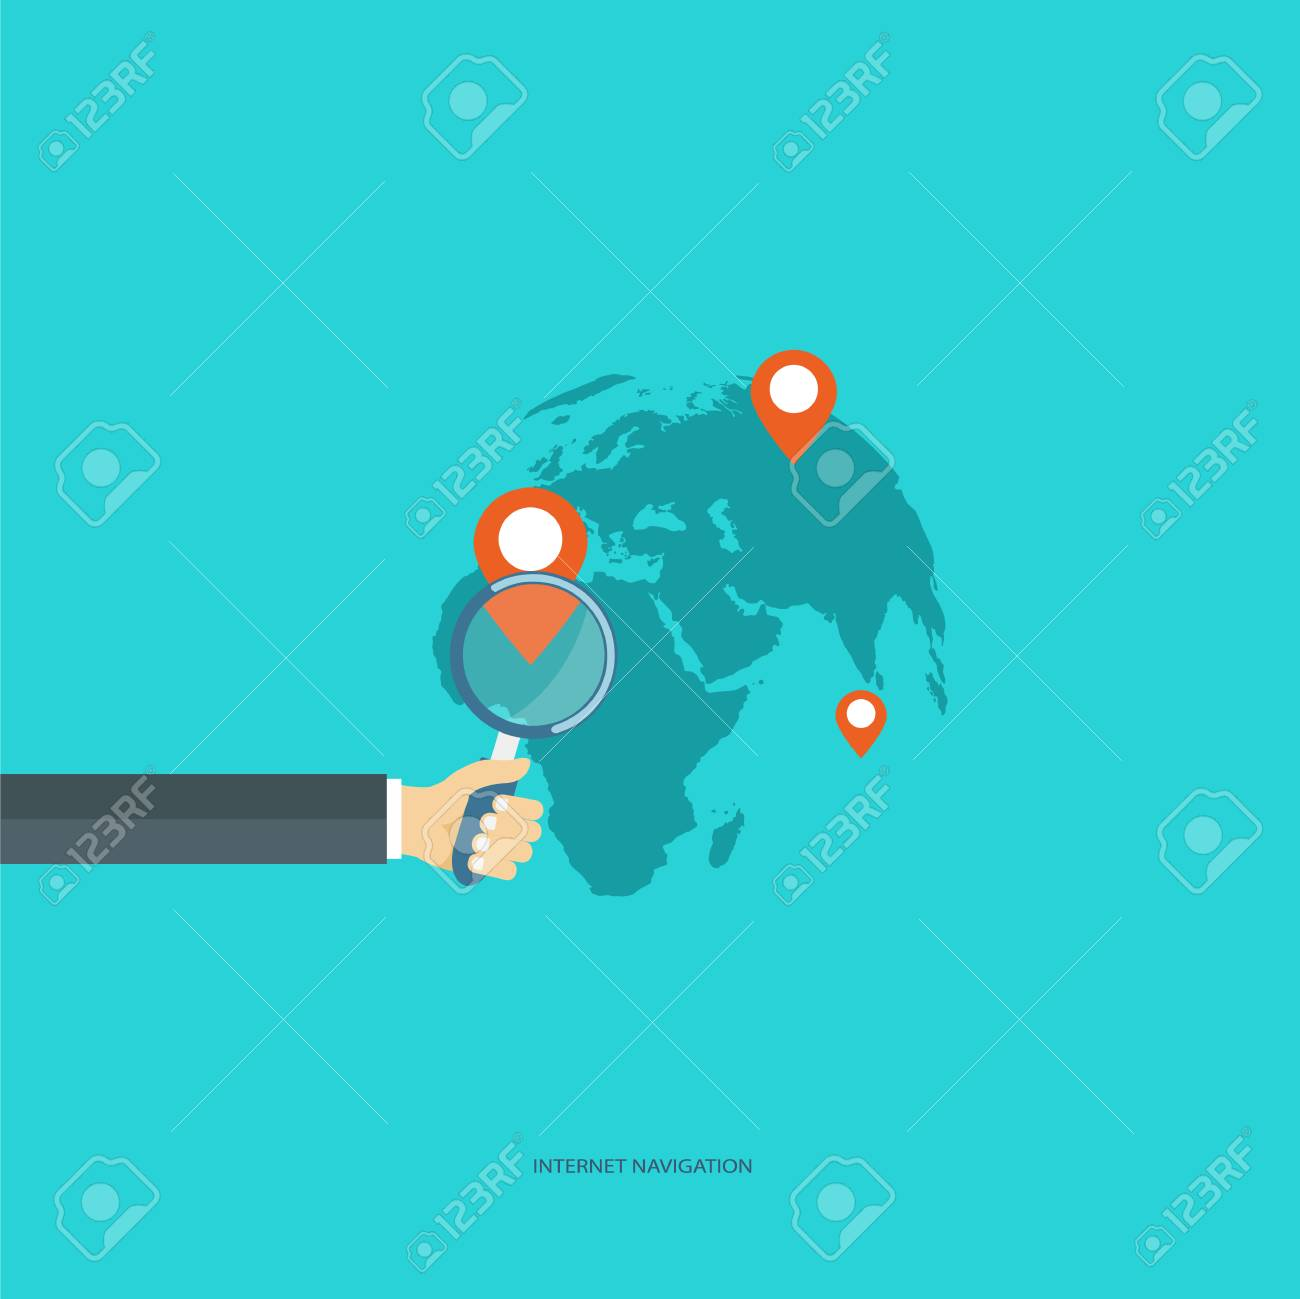 Internet navigation concept  Hand holding magnifying glass, world